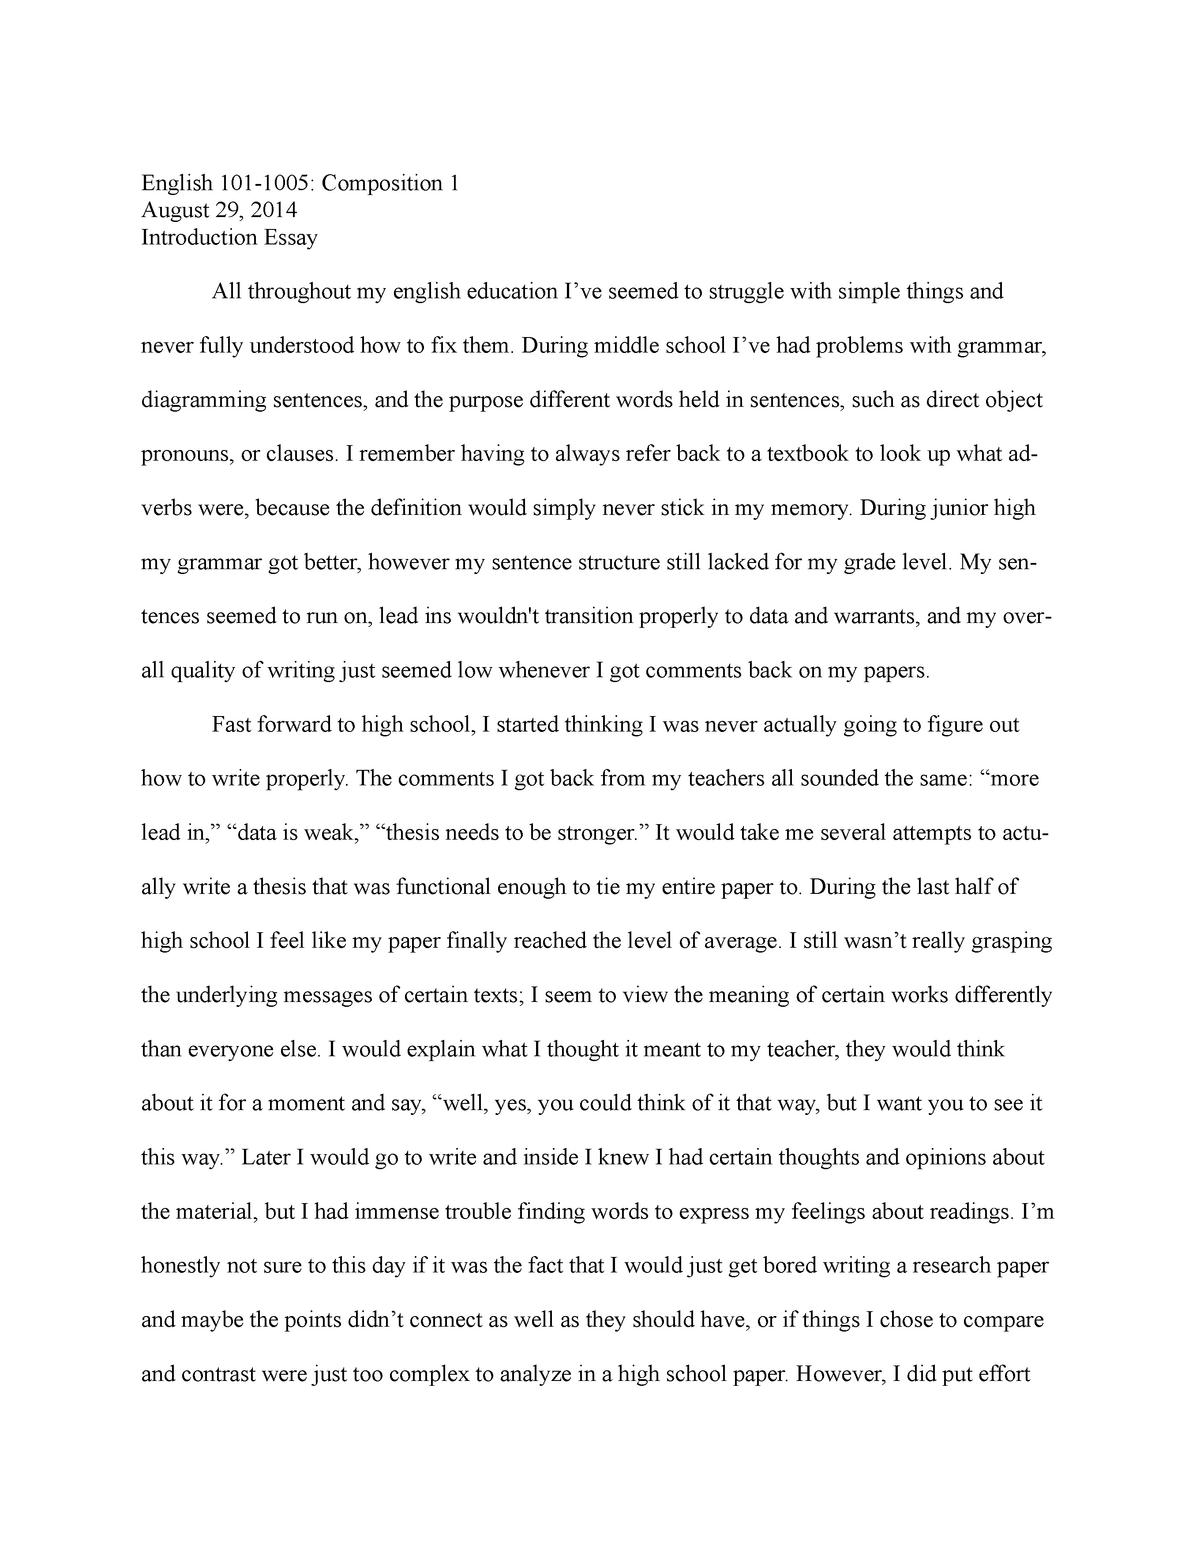 Essay on quality service